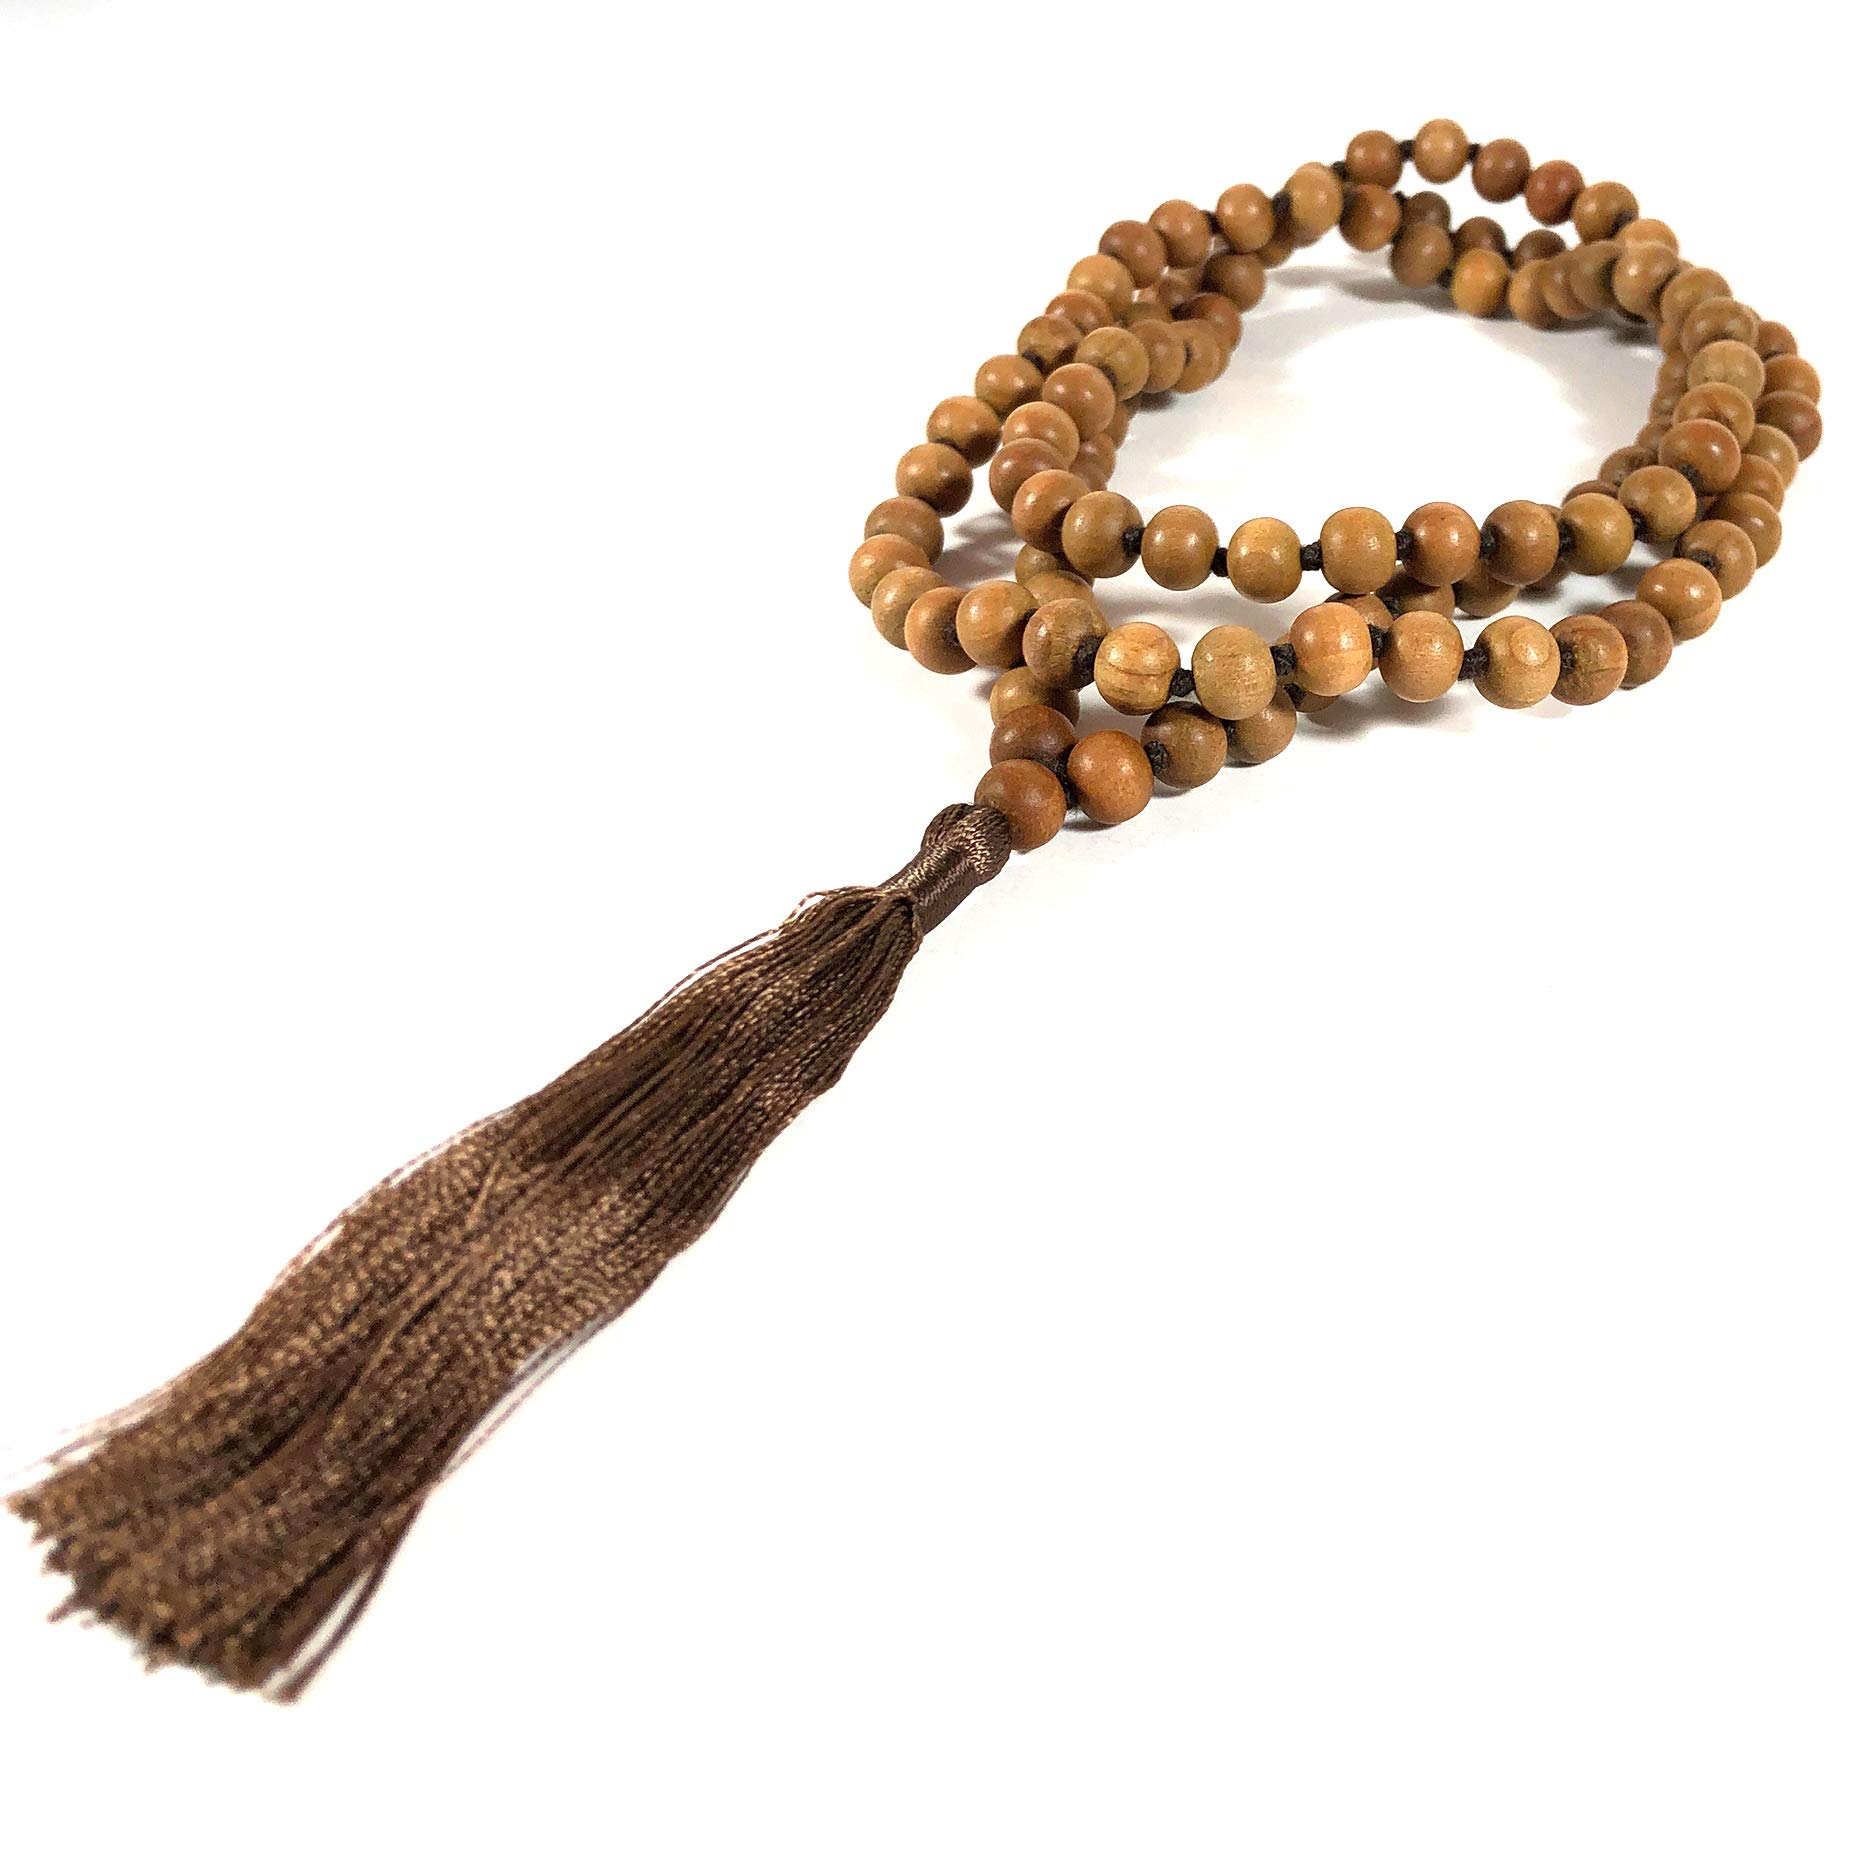 Agar Creations - 108 Bead Sandalwood 8mm Mala Bracelet - Hand Knotted - Buddha Beads, Yoga, Meditation, Tassel Necklace